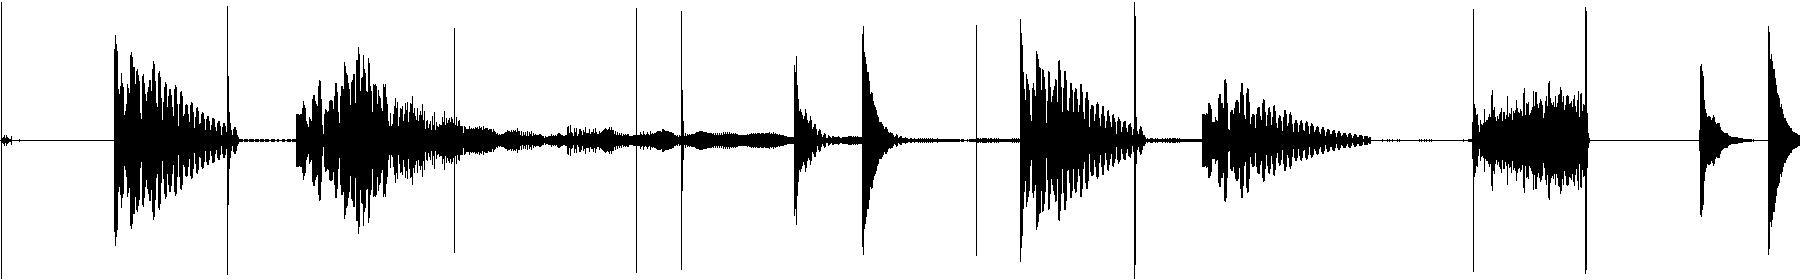 percussive synthloop 123